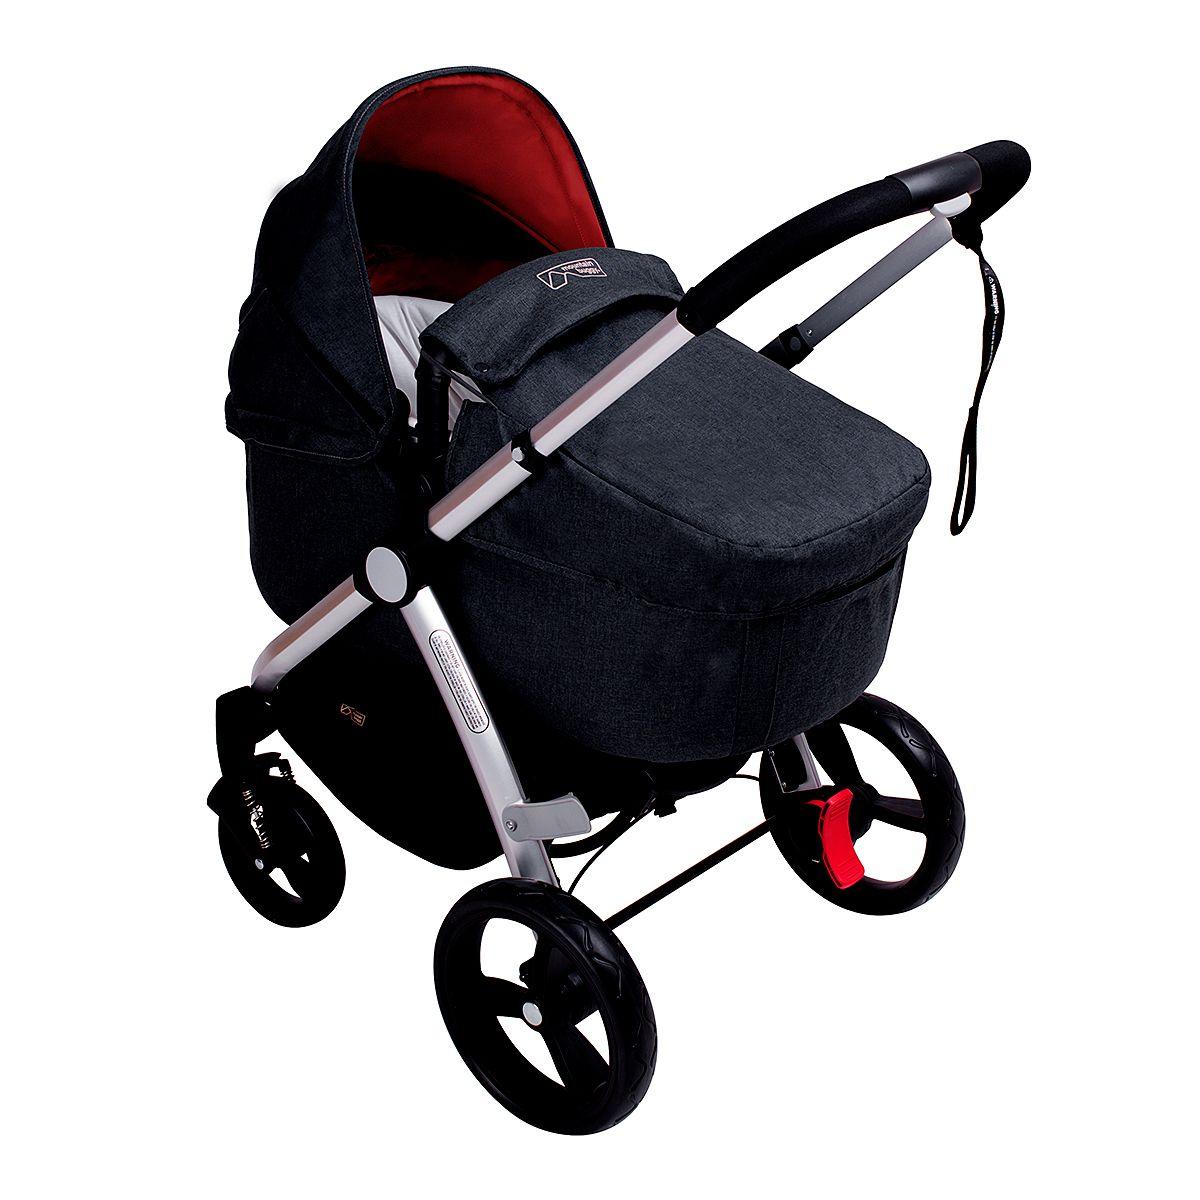 Cosmopolitan stroller for added comfort for baby